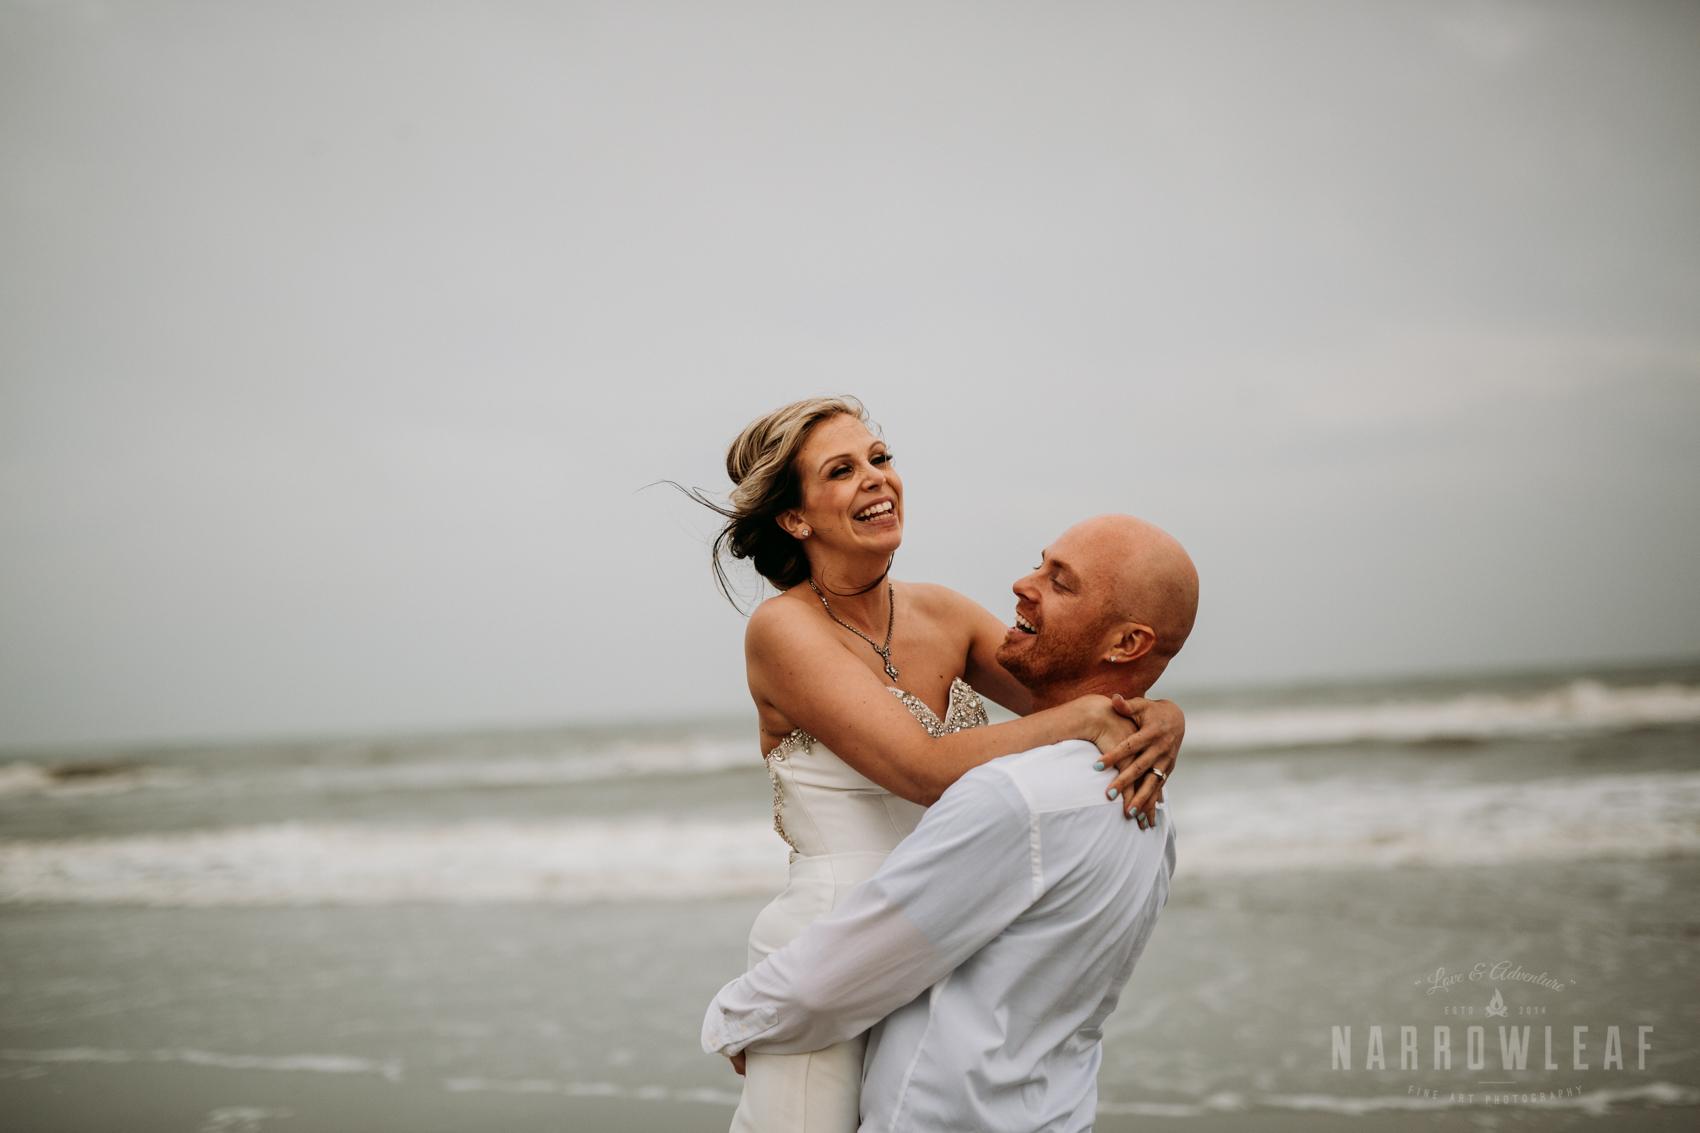 south-carolina-folly-beach-destination-wedding-NarrowLeaf_Love_&_Adventure_Photography-2532.jpg